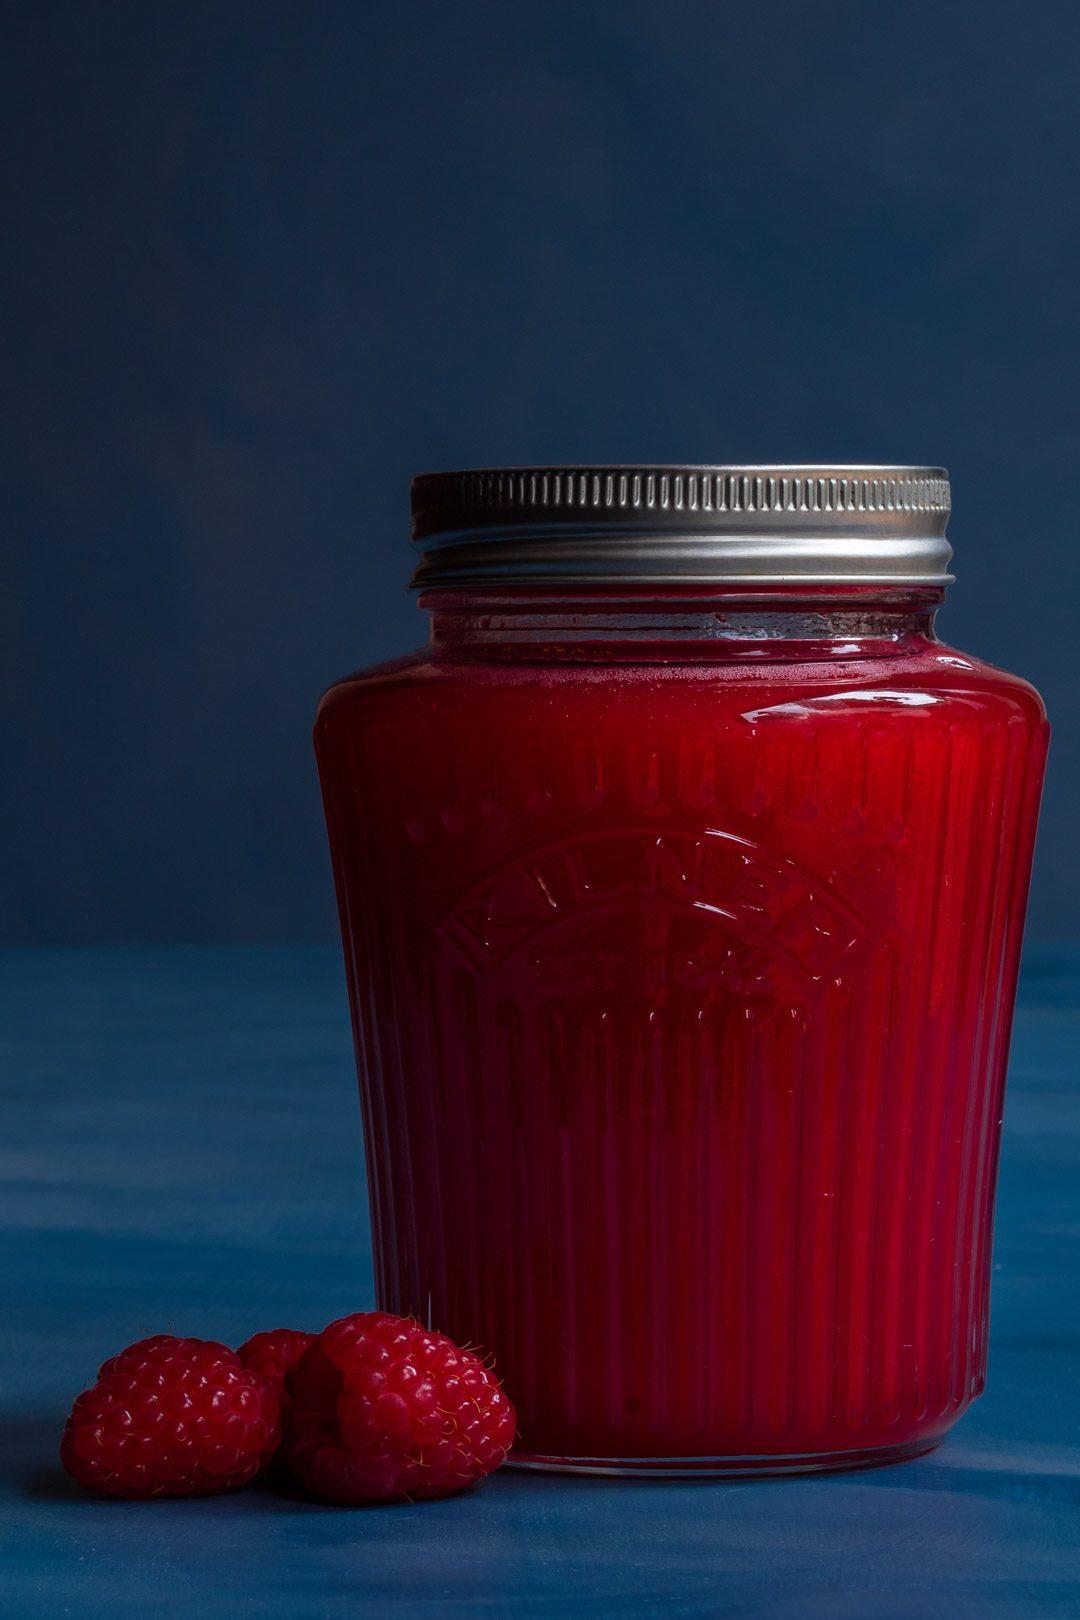 Raspberry shrub syrup drinking vinegar in vintage style preserving jar